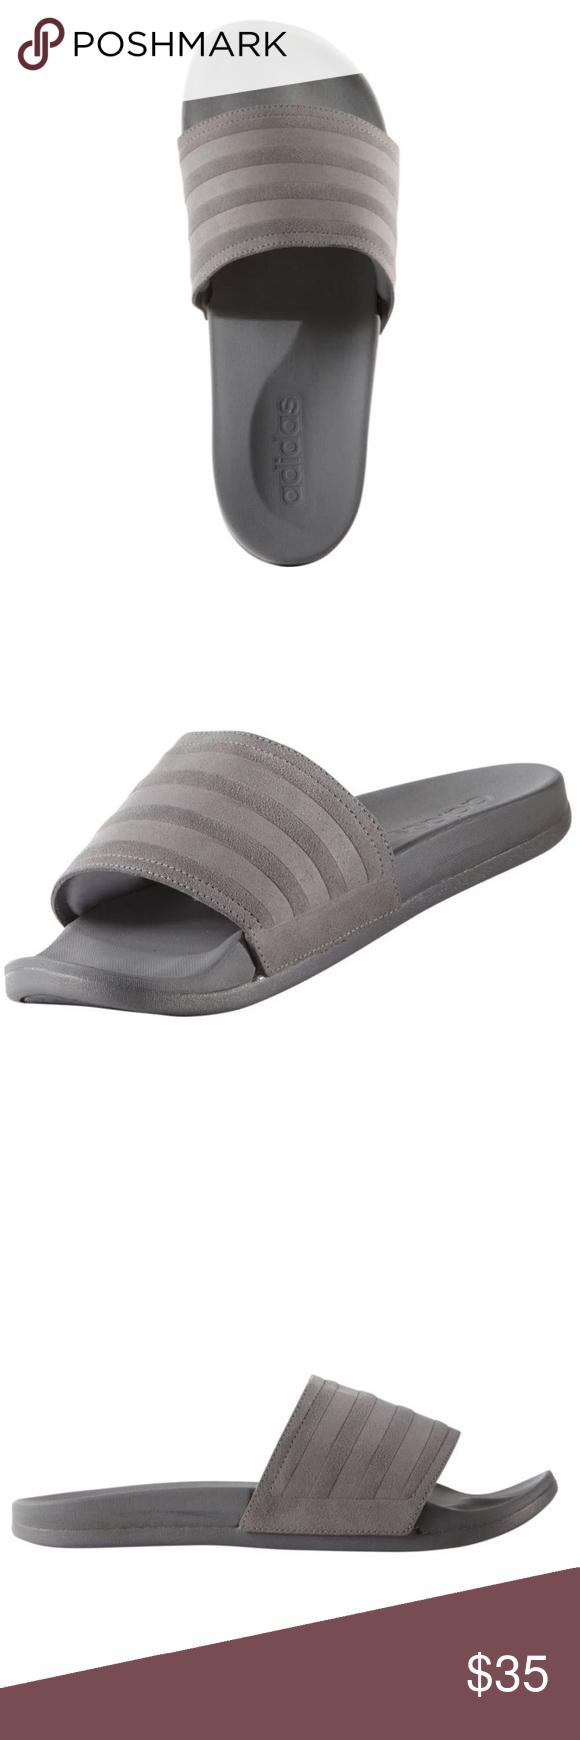 f73b4f990cc26c Adidas Adilette Suede Slides Sandals Slippers Adidas adilette suade slides slippers  Men size 10. Great suade slides Super comfortable